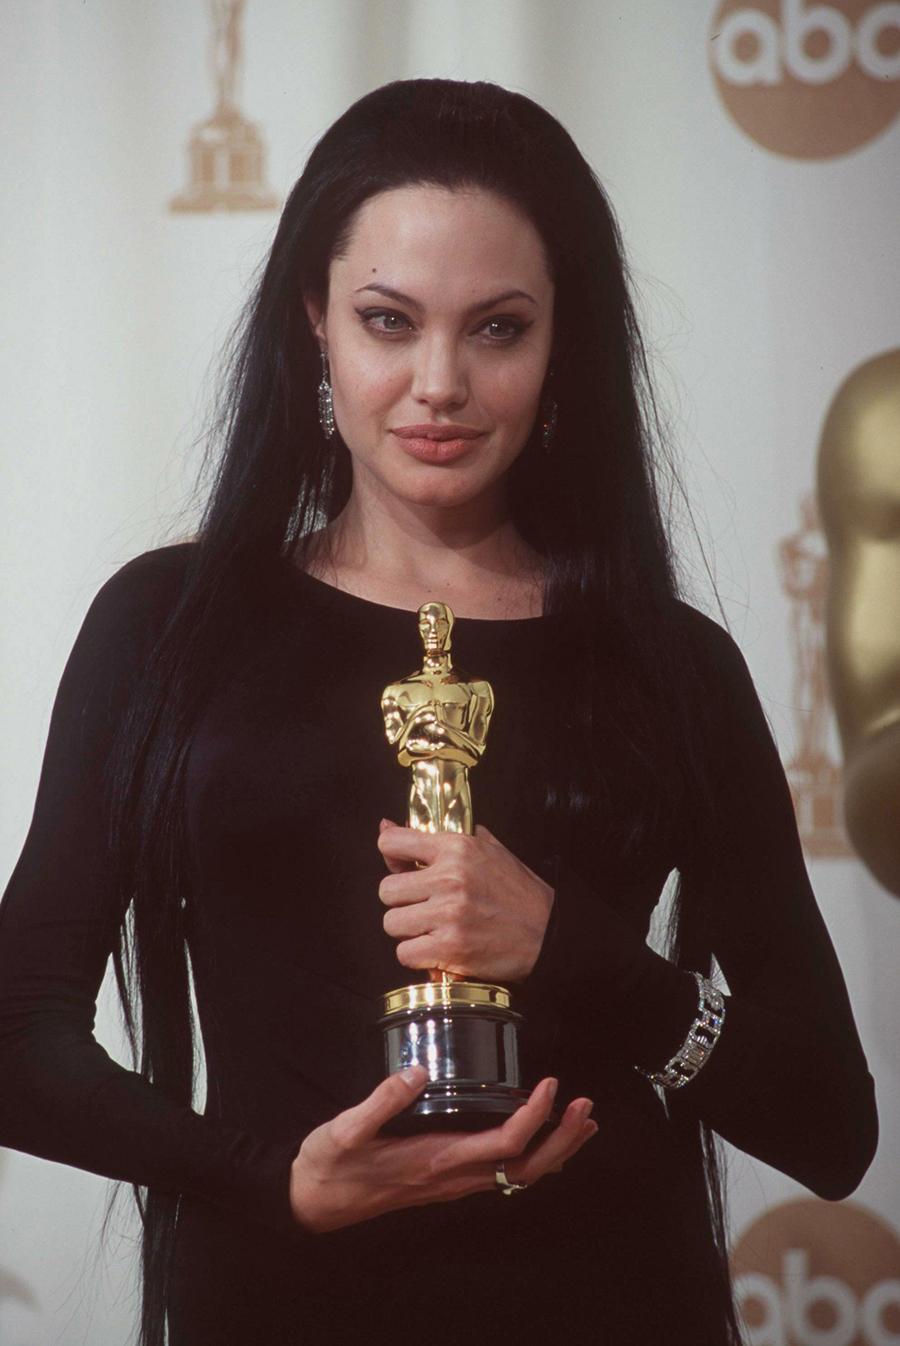 Tại lễ trao giải Oscar 2000, Jolie